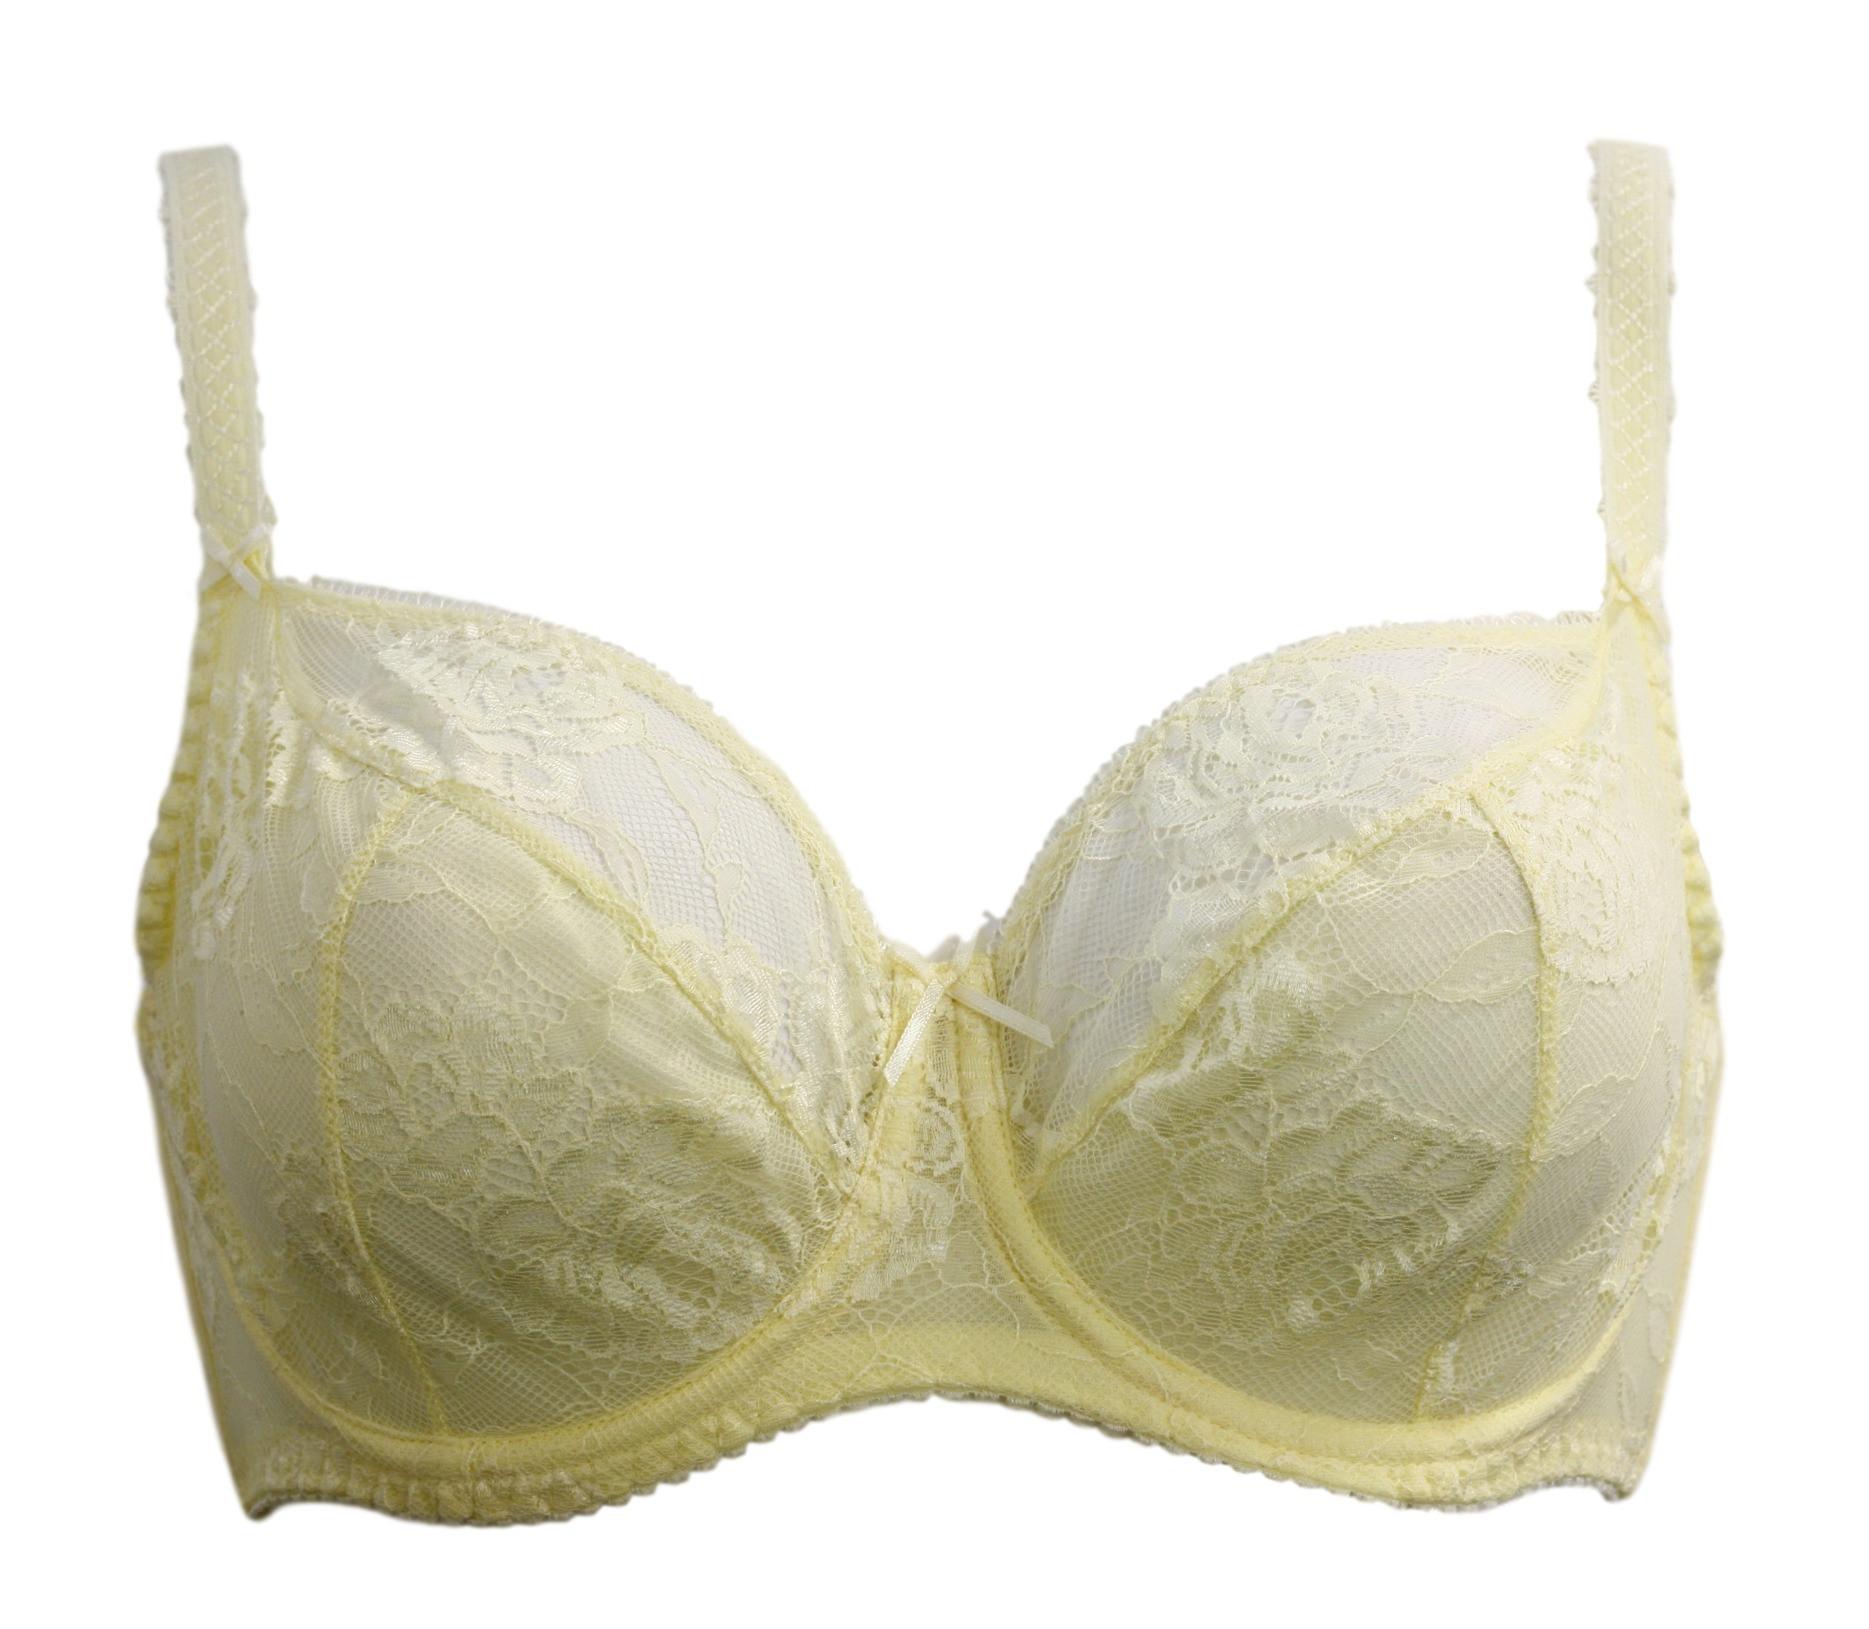 Podprsenka 1281 Maxi - Ava Barva: žlutá, Velikost: 80I